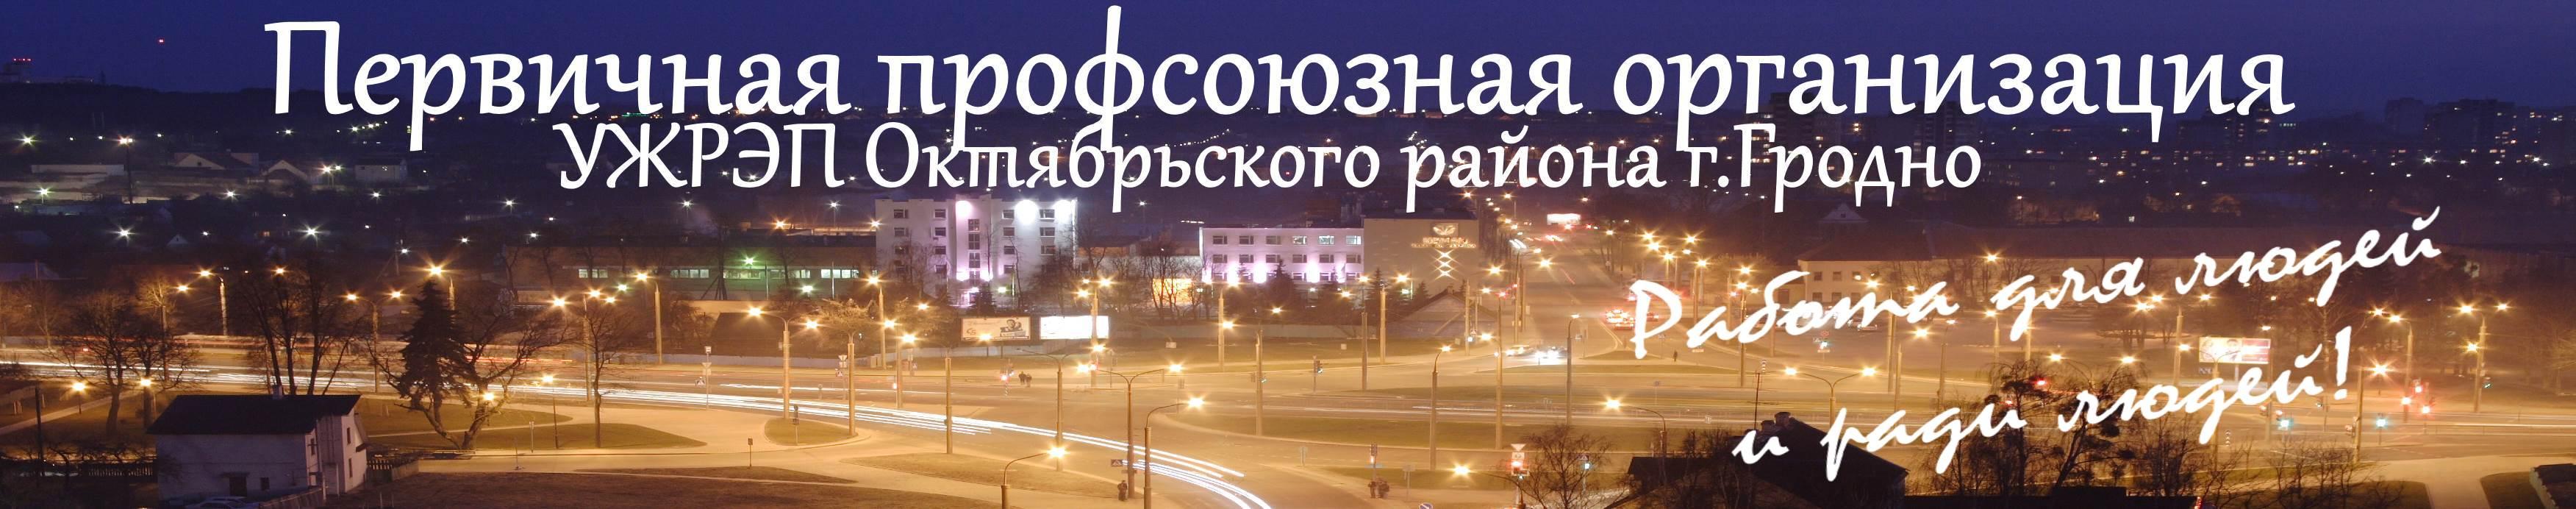 Профсоюз УЖРЭП Октябрьского района г.Гродно